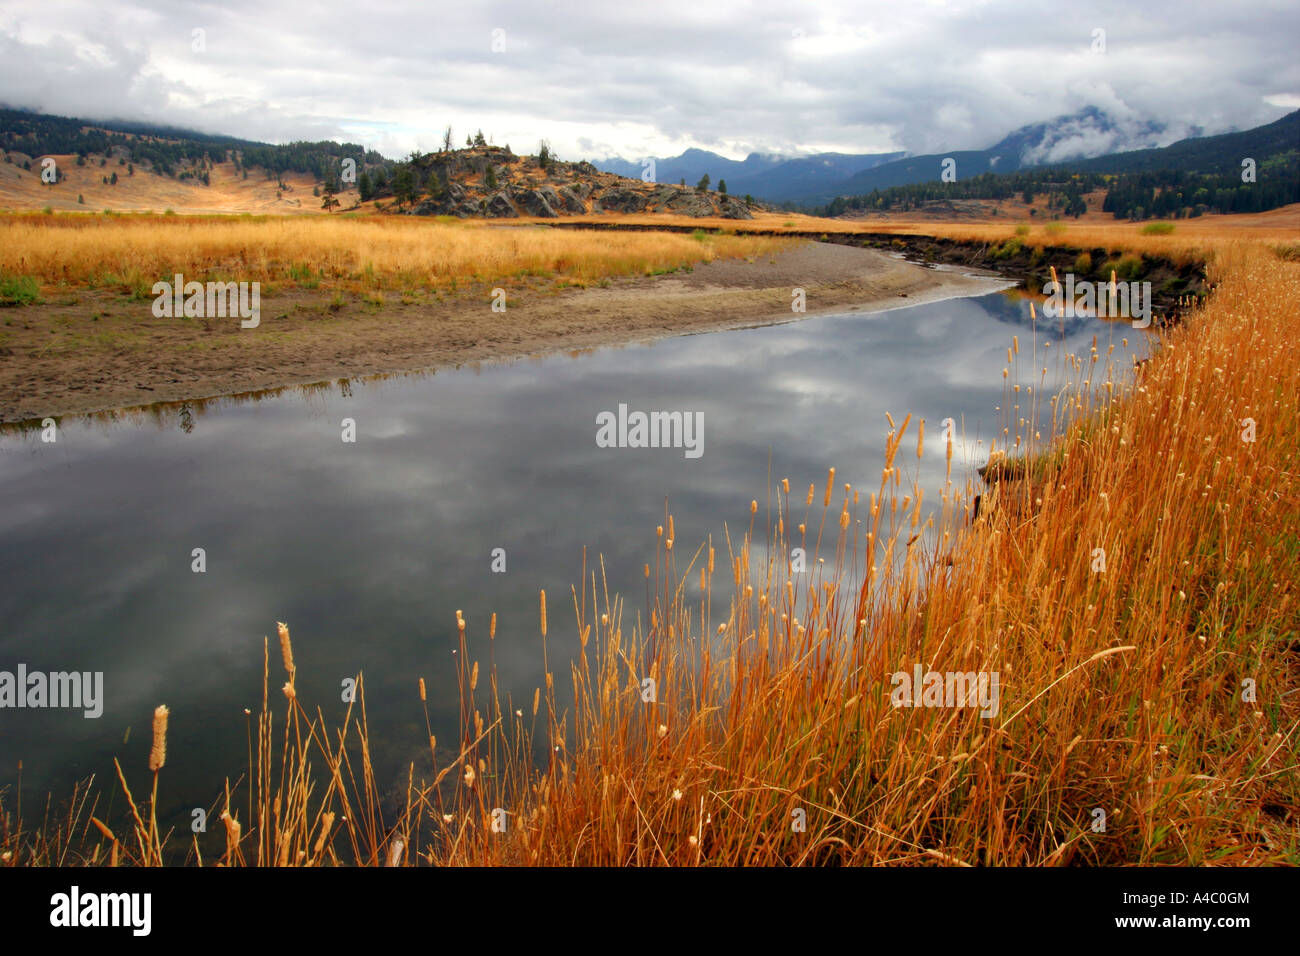 Slough creek, parc national de Yellowstone, Wyoming Banque D'Images